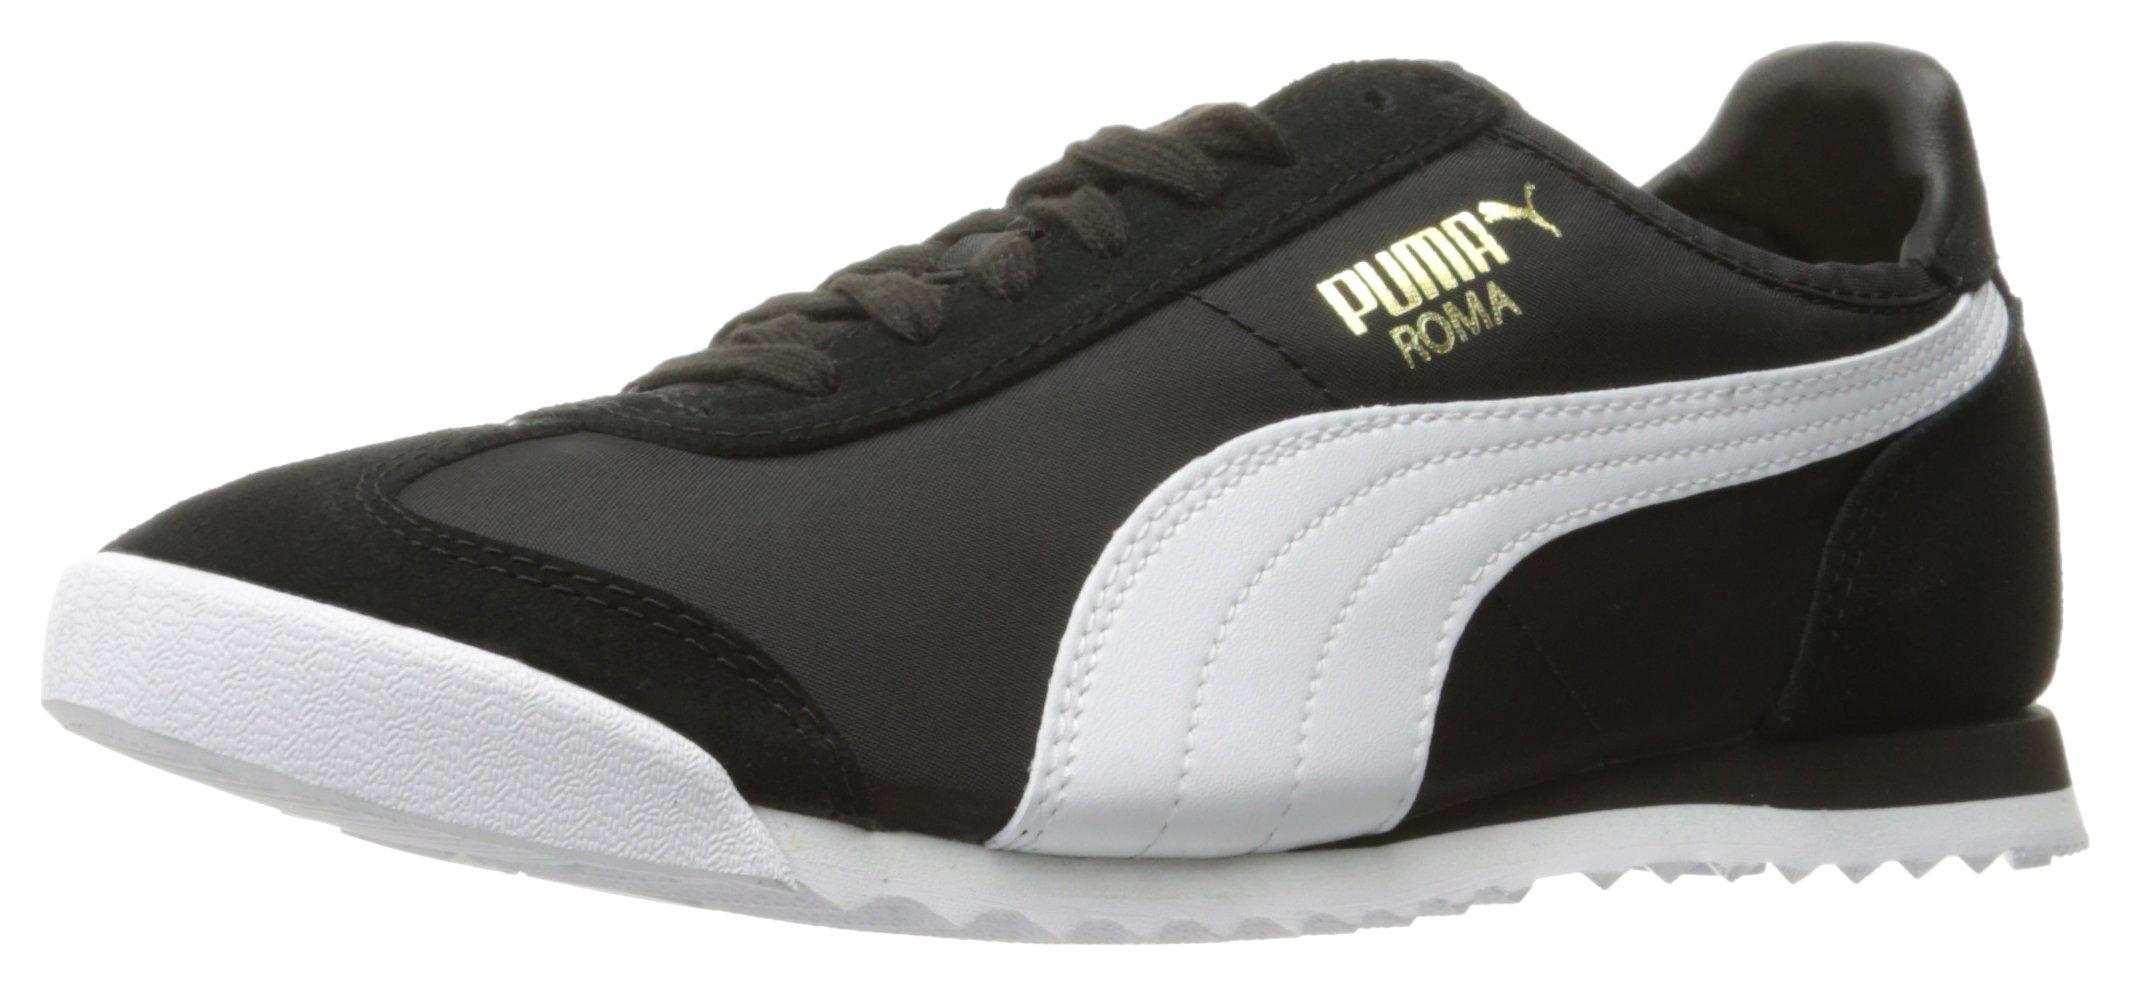 PUMA Roma OG Nylon Fashion Sneaker- Buy